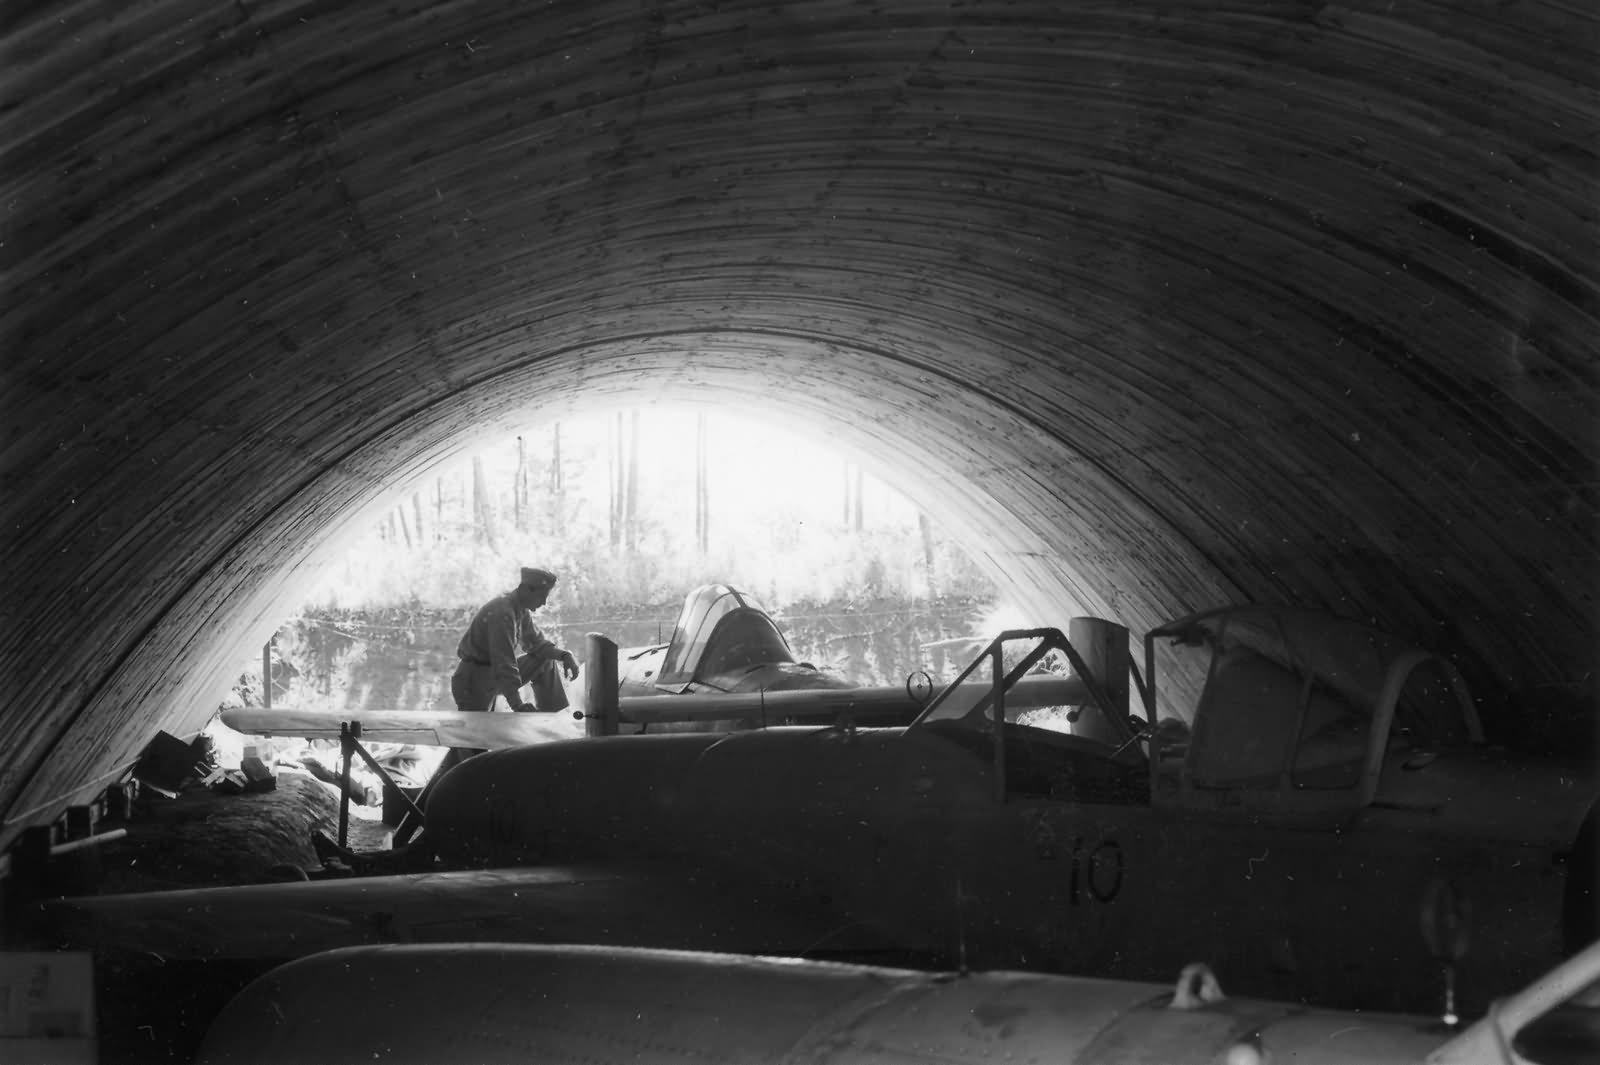 Yokosuka MXY7 Ohka rocket bombs found in underground hangar Atsugi 1945